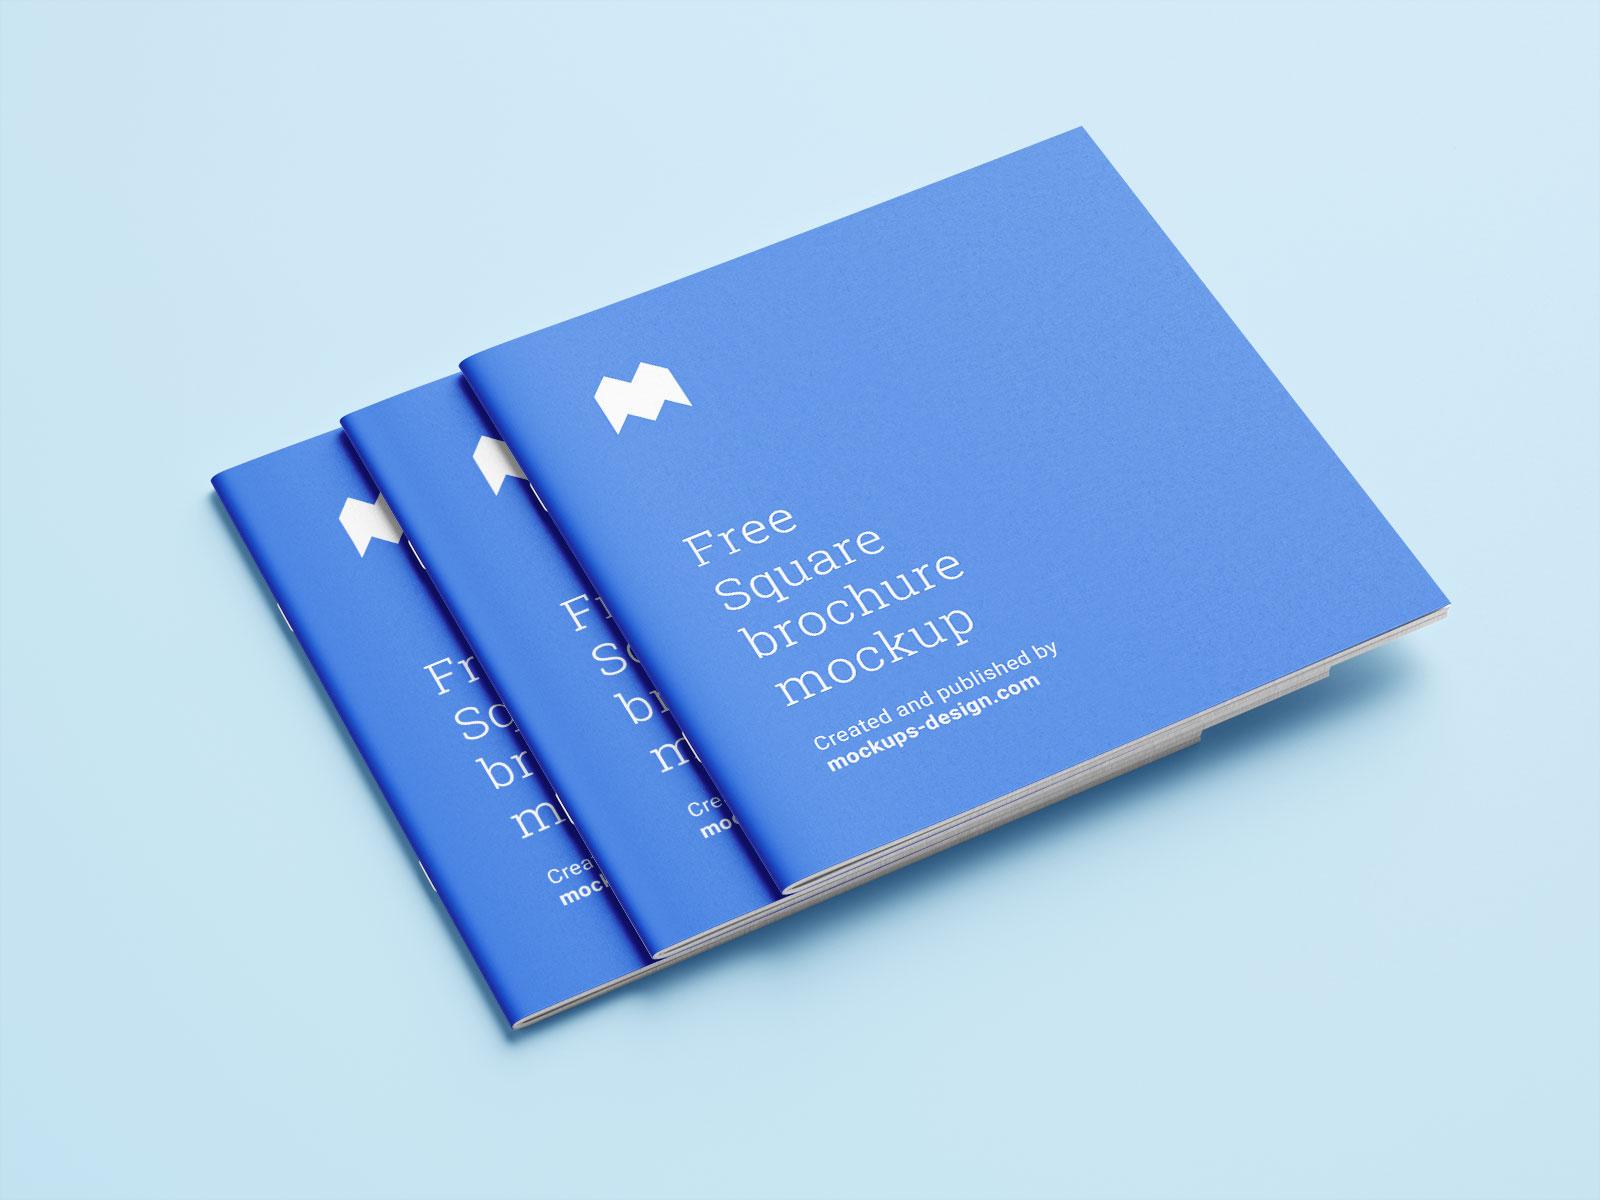 Free_Square_Brochure_Magazine_Mockup_PSD-Set (2)